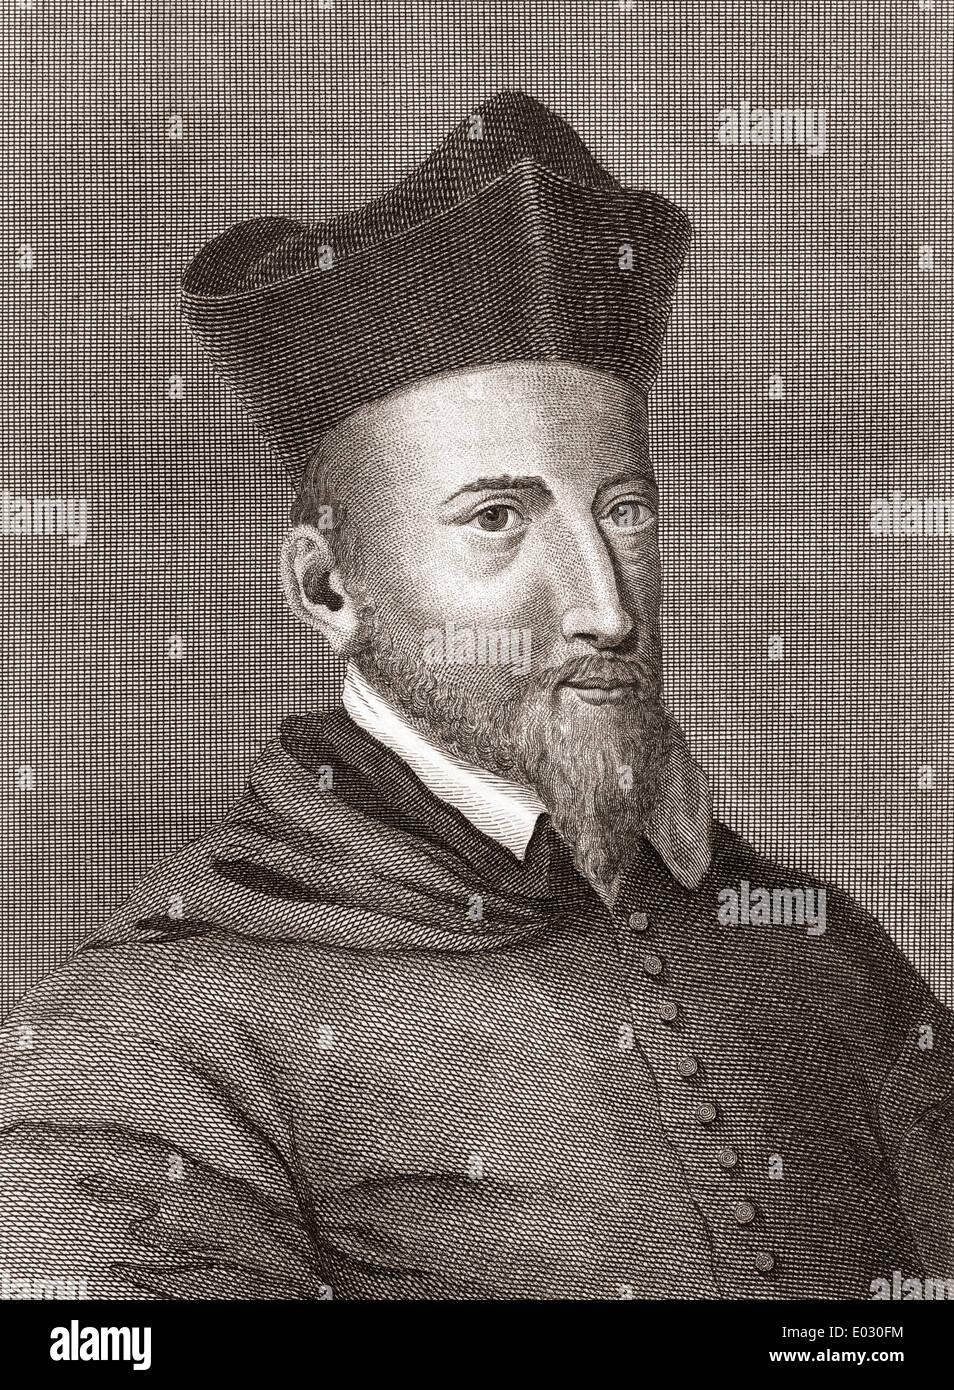 John Lesley, or Leslie, 1527 –1596. Scottish Roman Catholic bishop of Ross and historian. - Stock Image